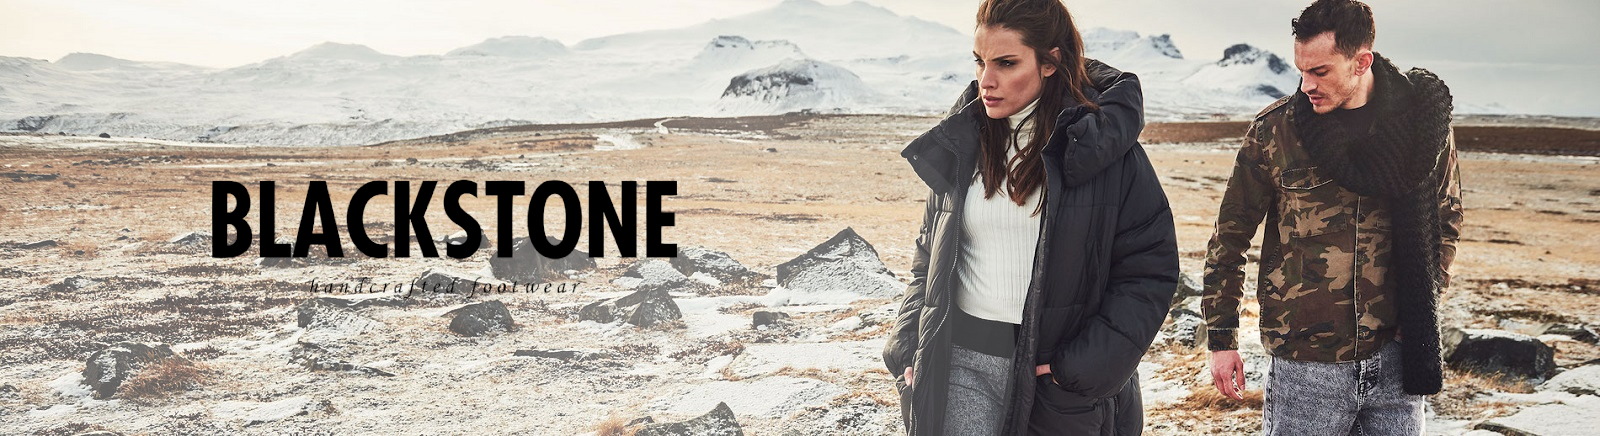 Blackstone Herrenschuhe online entdecken im Juppen Shop